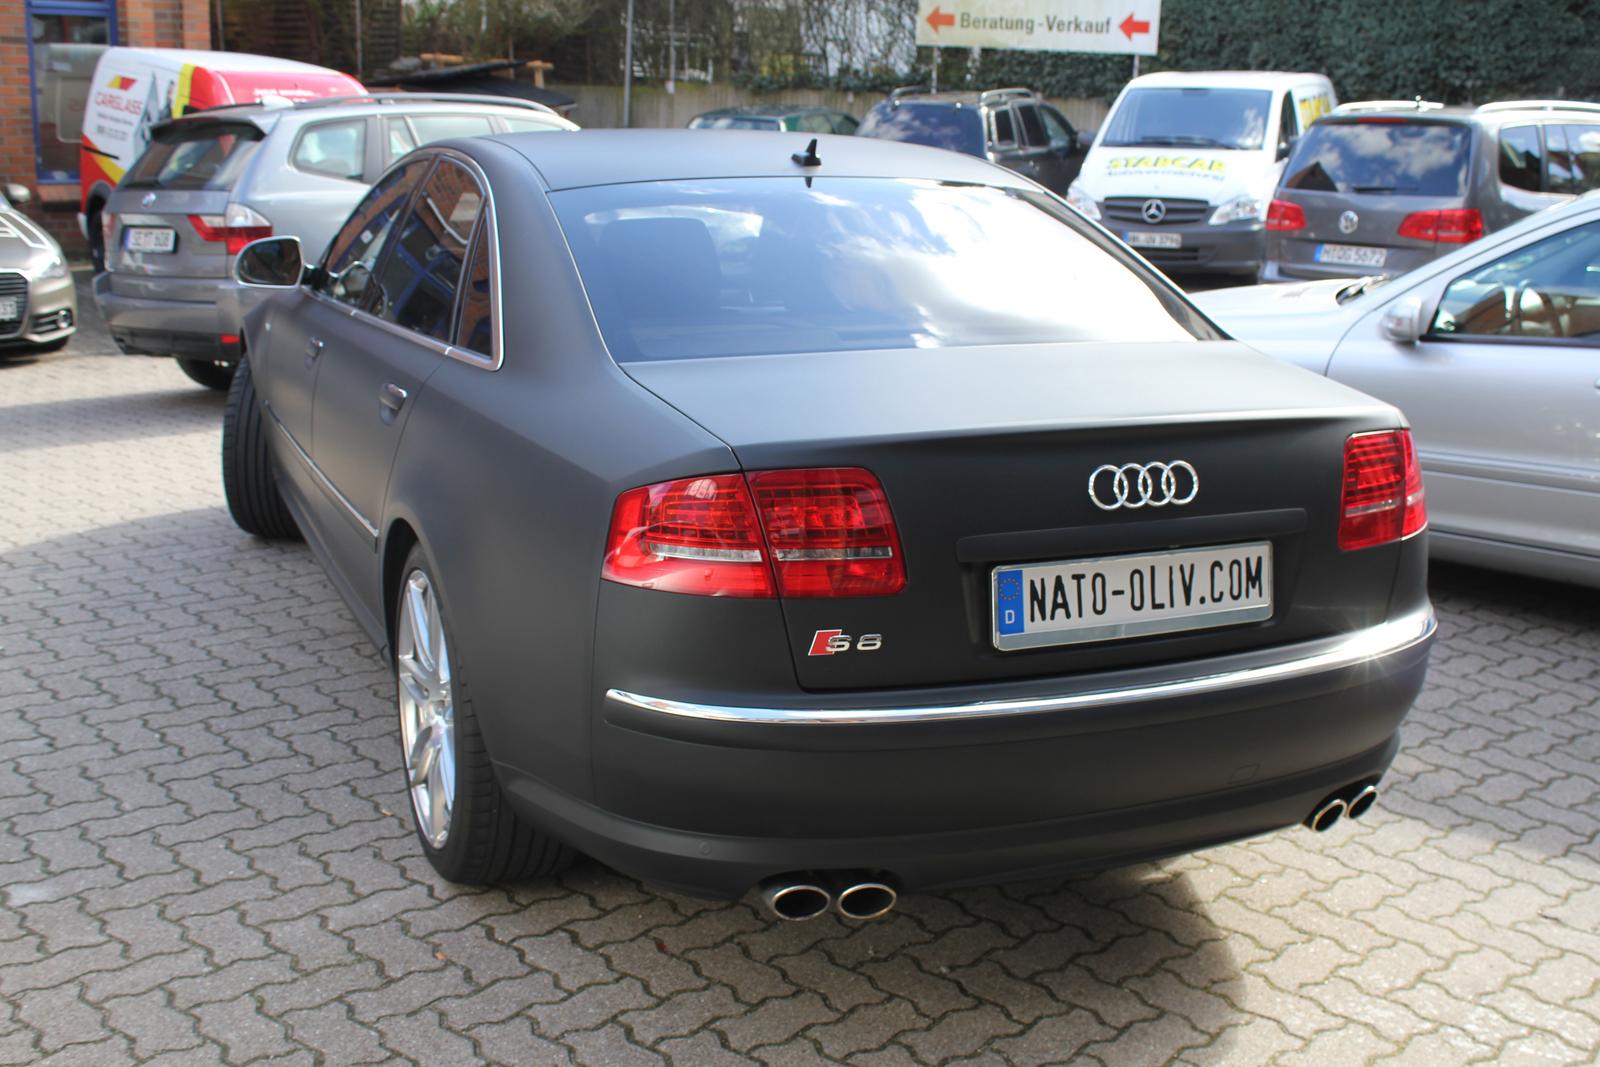 AUDI_S8_CAR-WRAPPING_SCHWARZ_MATT_05